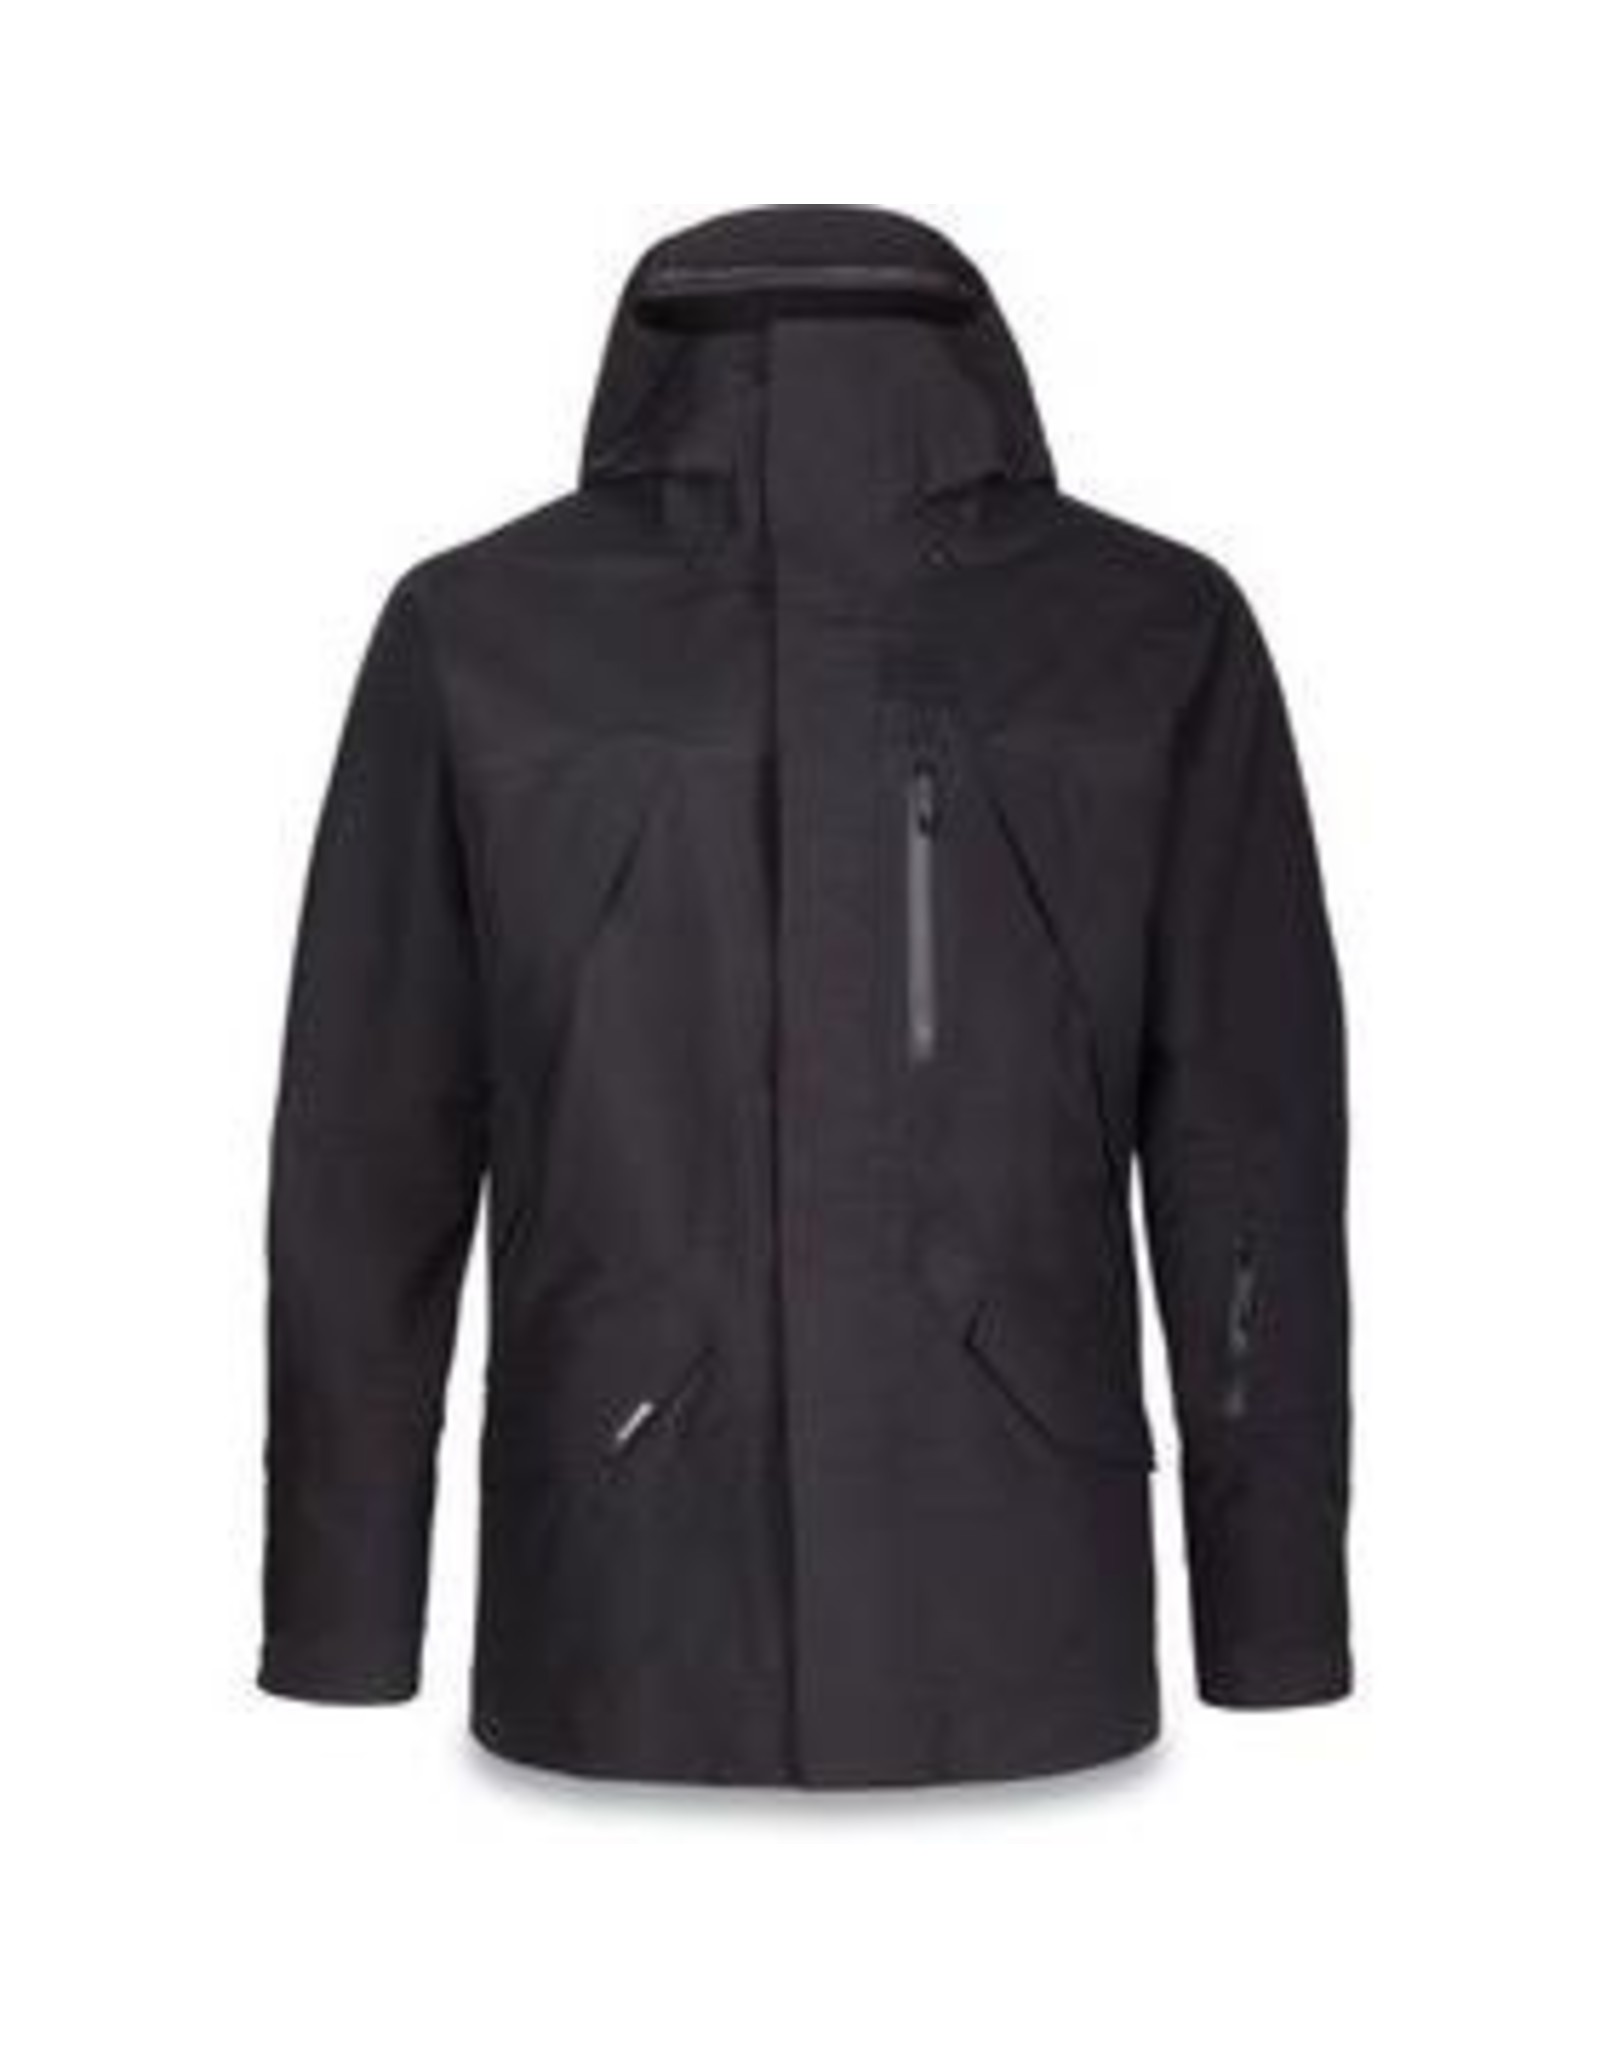 Dakine Dakine - Sawtooth 3L Jacket - Black - XL